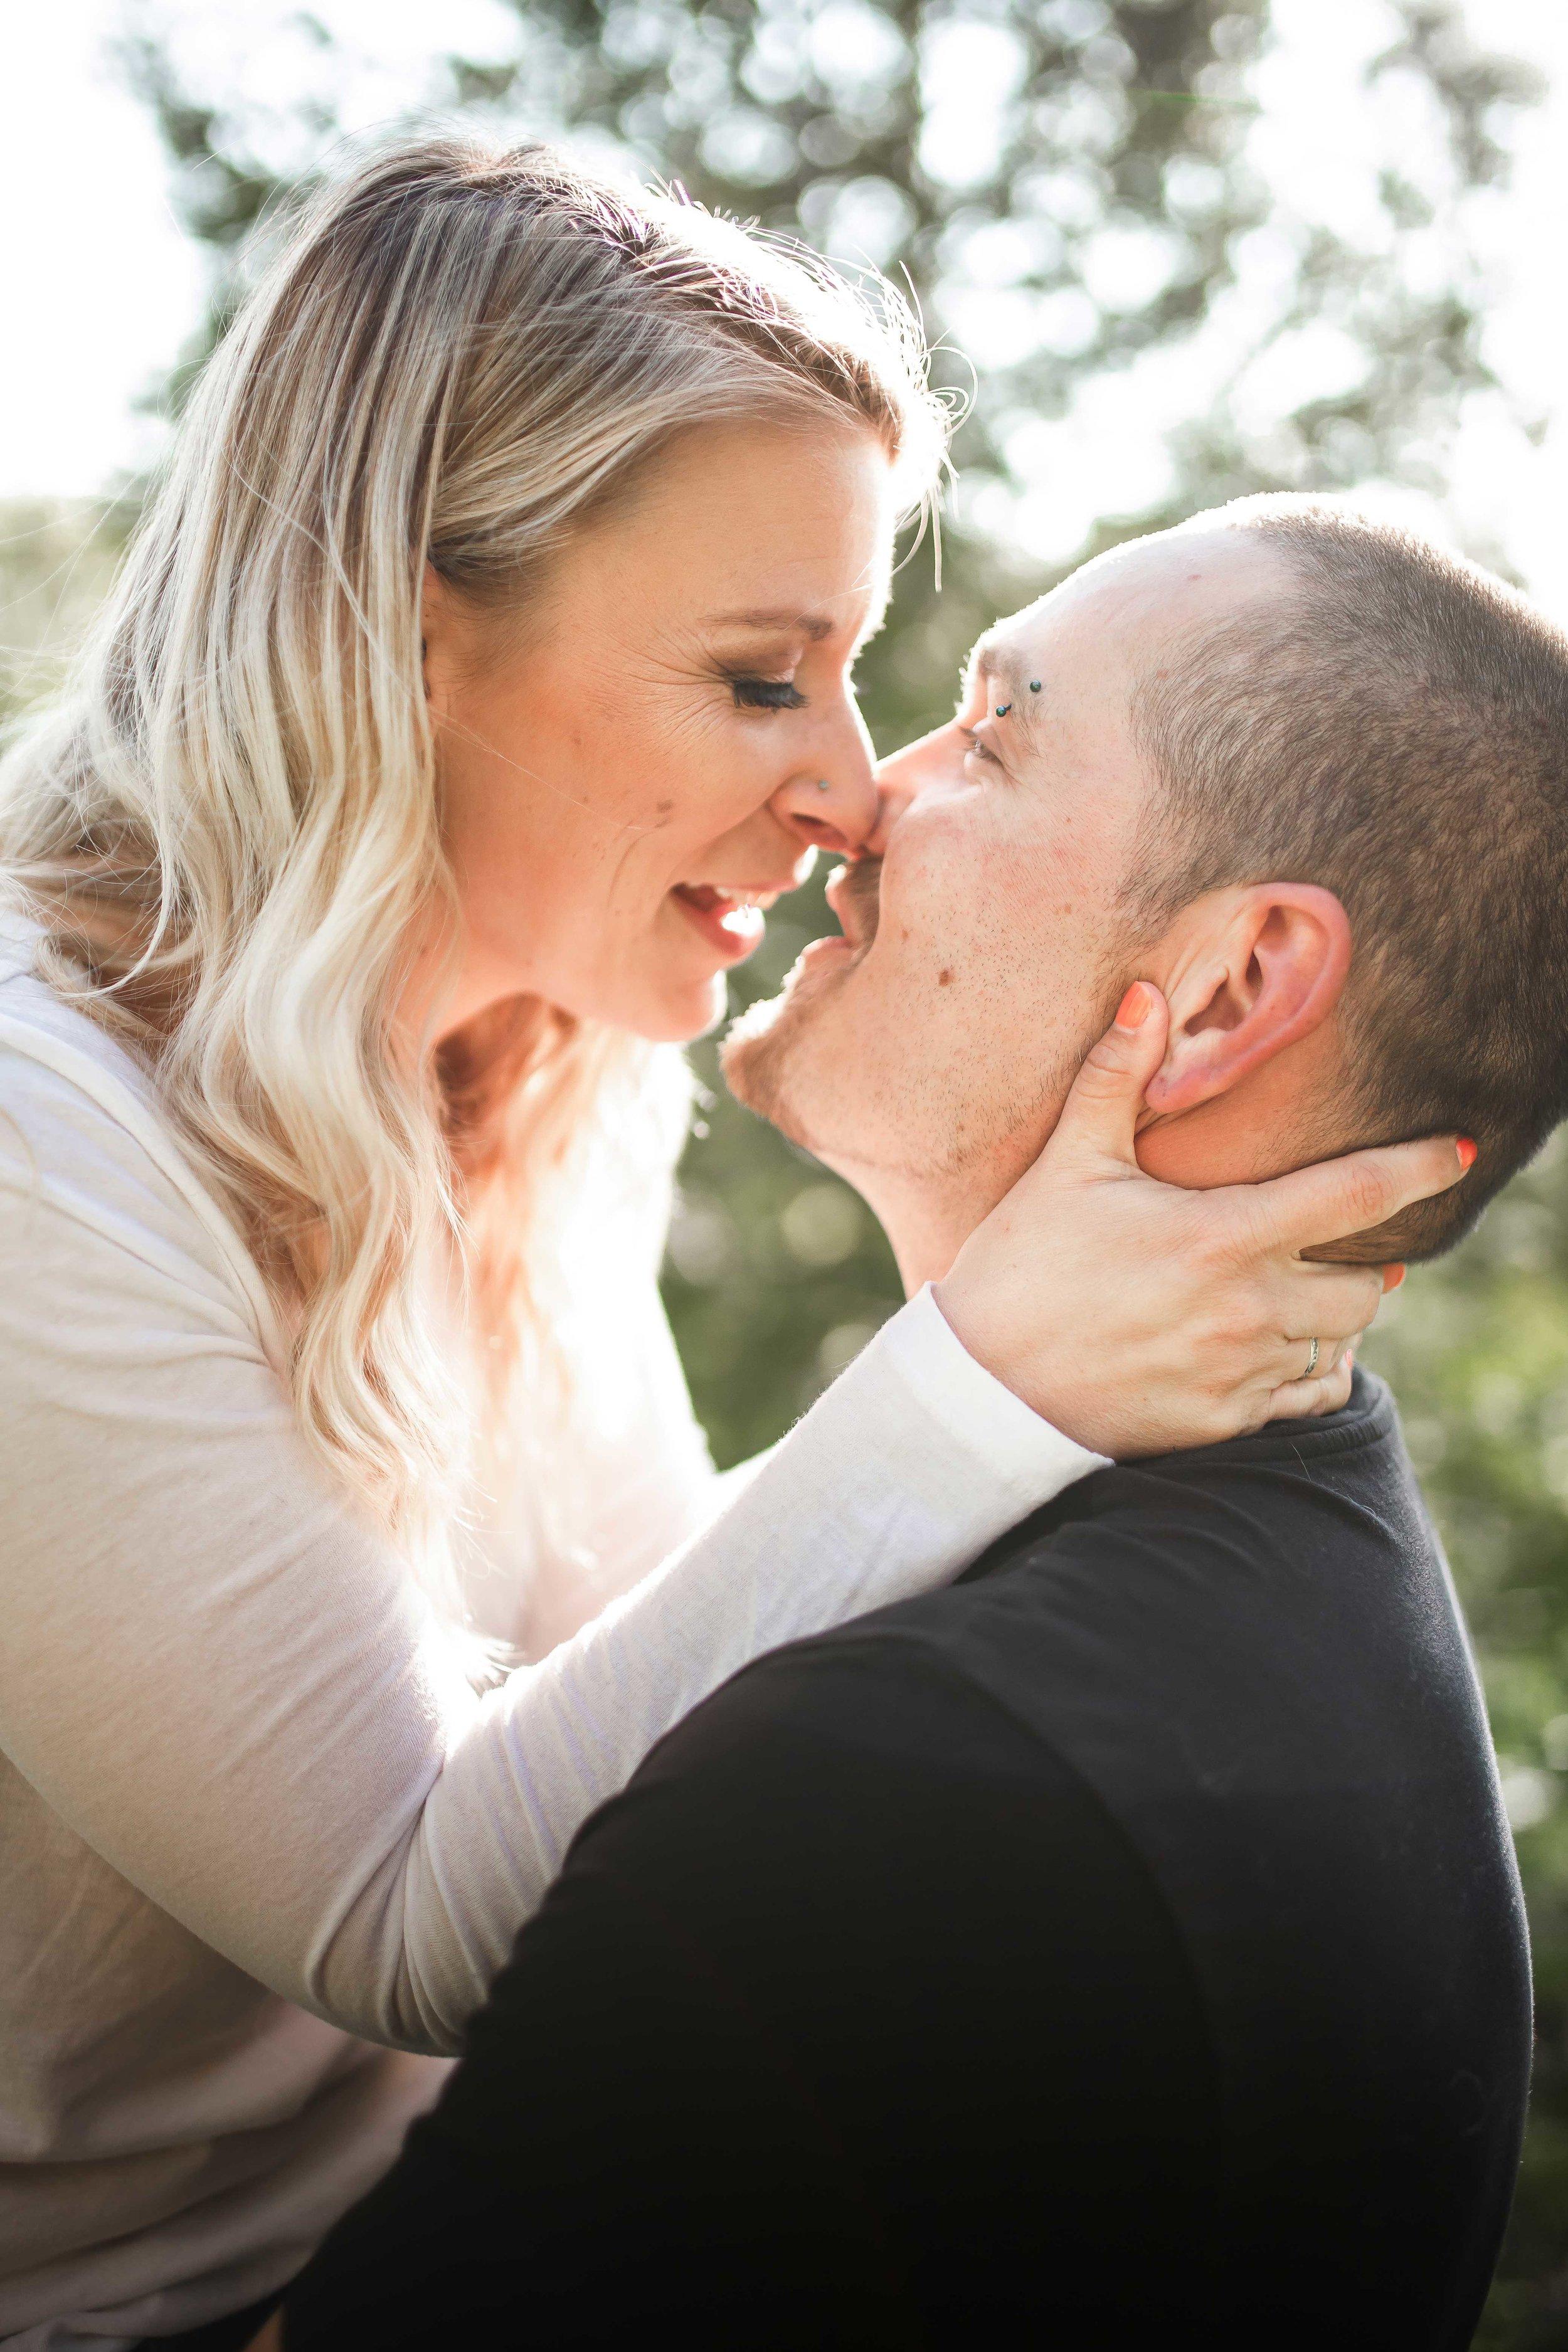 Amy-D-Photography--Wedding-Photography--Barrie-Wedding-Photography--Engagement-Session---Engagement-Pose-8.jpg